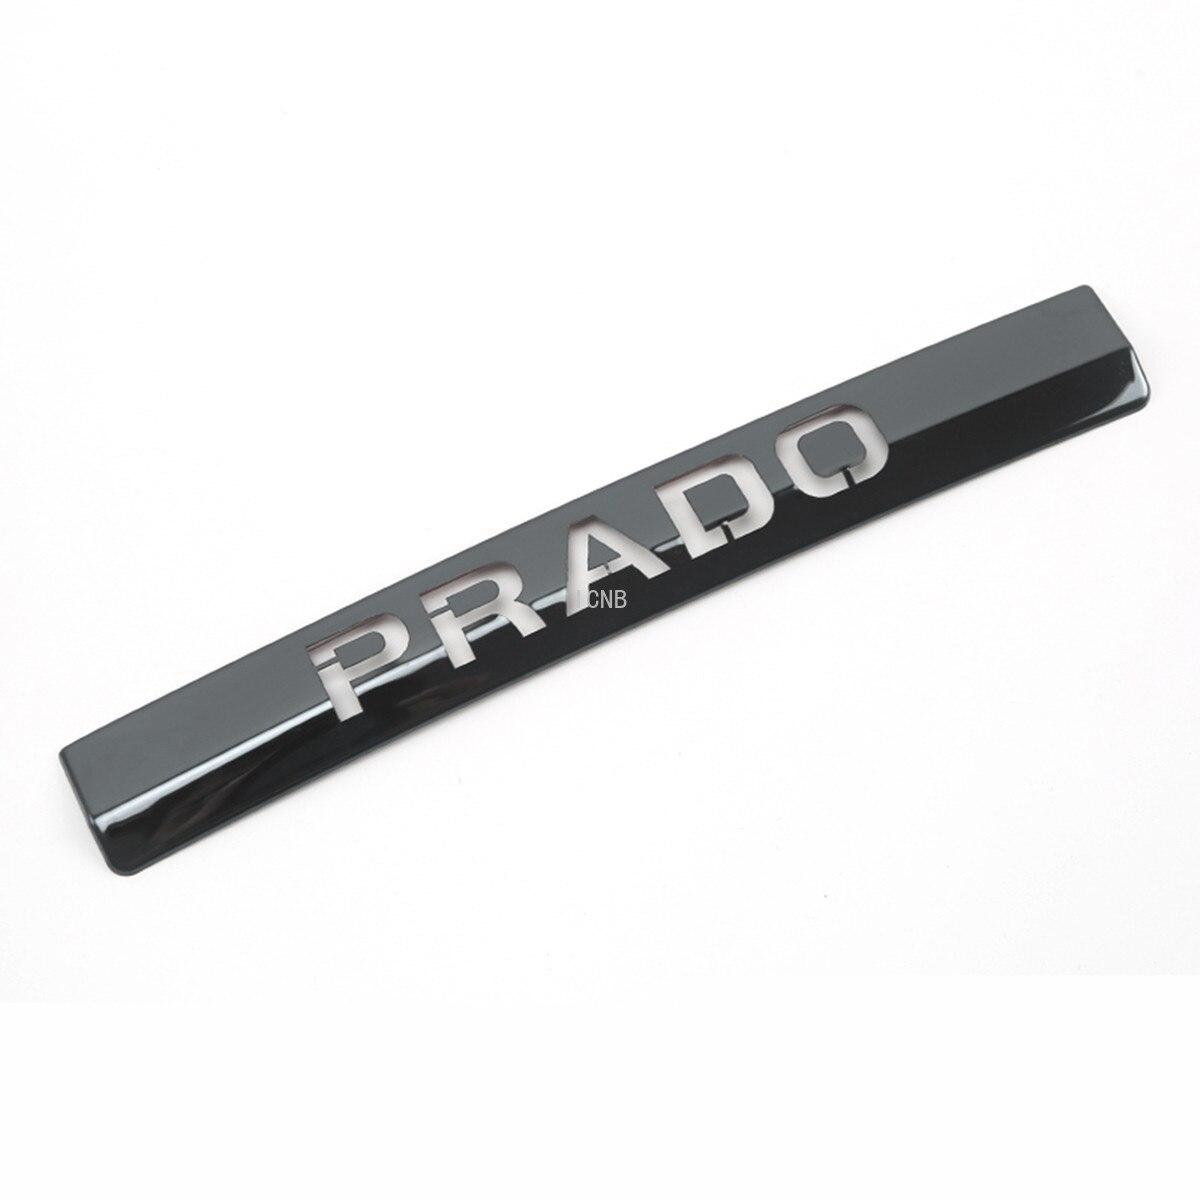 For Toyota Land Cruiser Prado 150 FJ150 2010 2011 2012 2013-2016 2017 2018 2019 Stainless Steel Brake Light Decorative Stickers